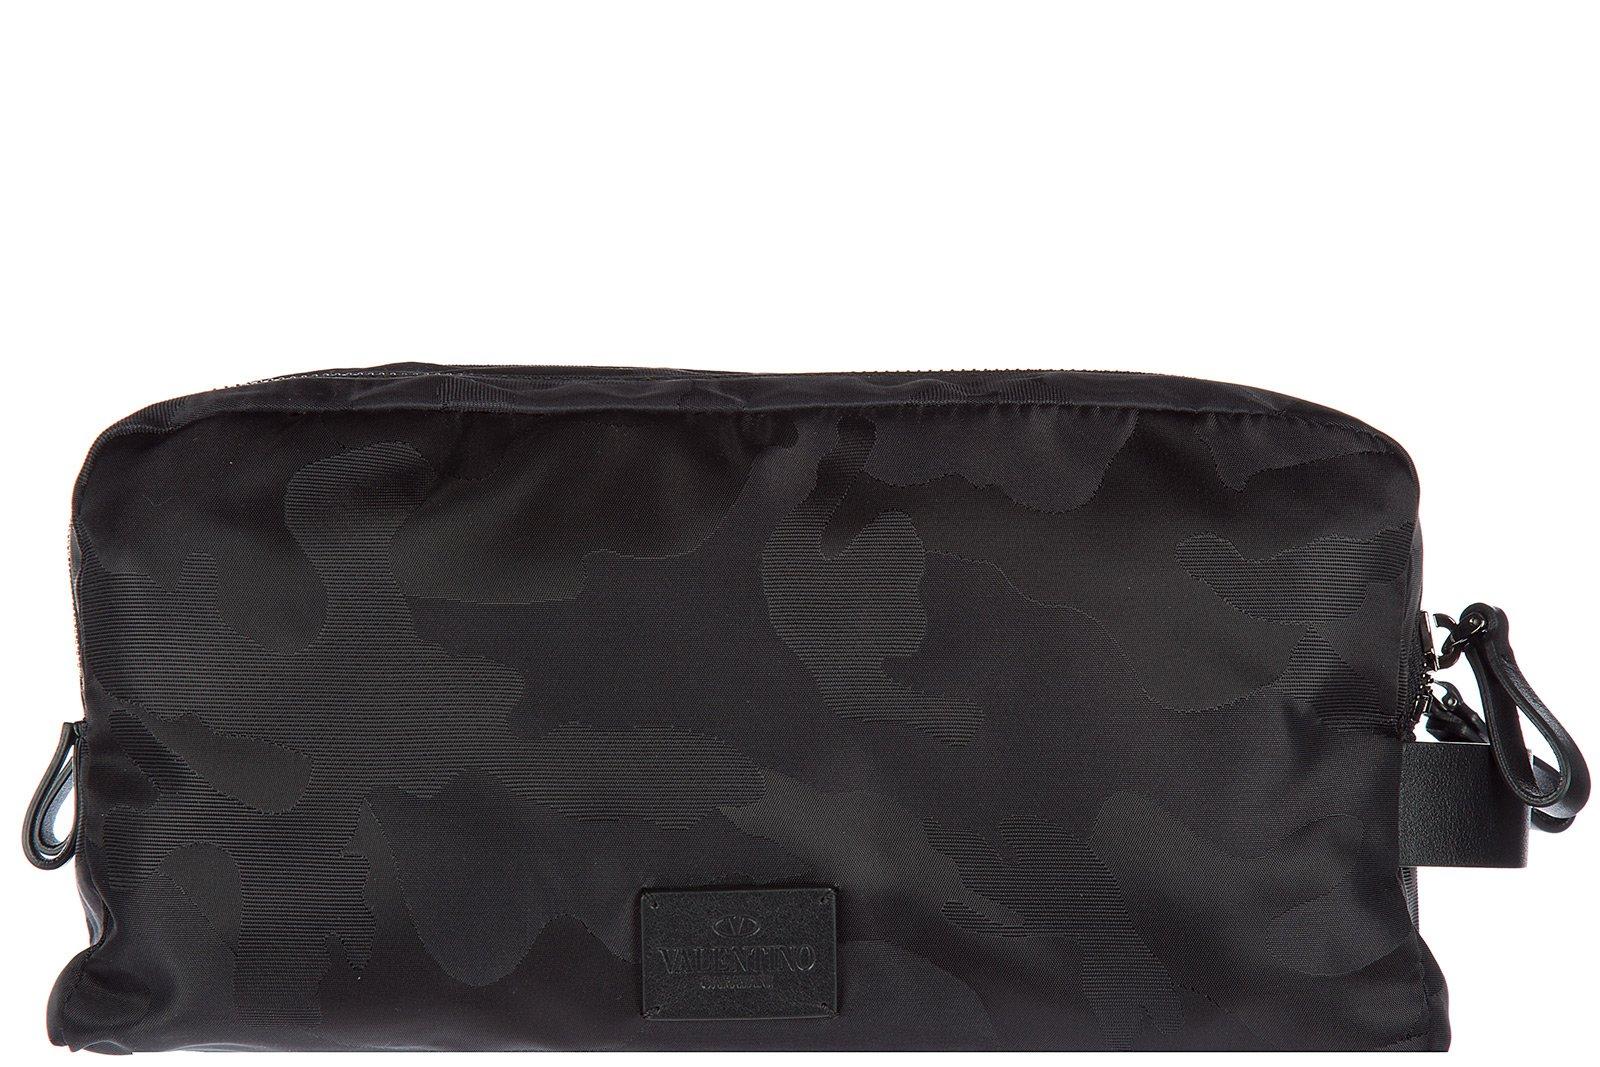 Valentino men's Nylon travel toiletries beauty case wash bag black by Valentino